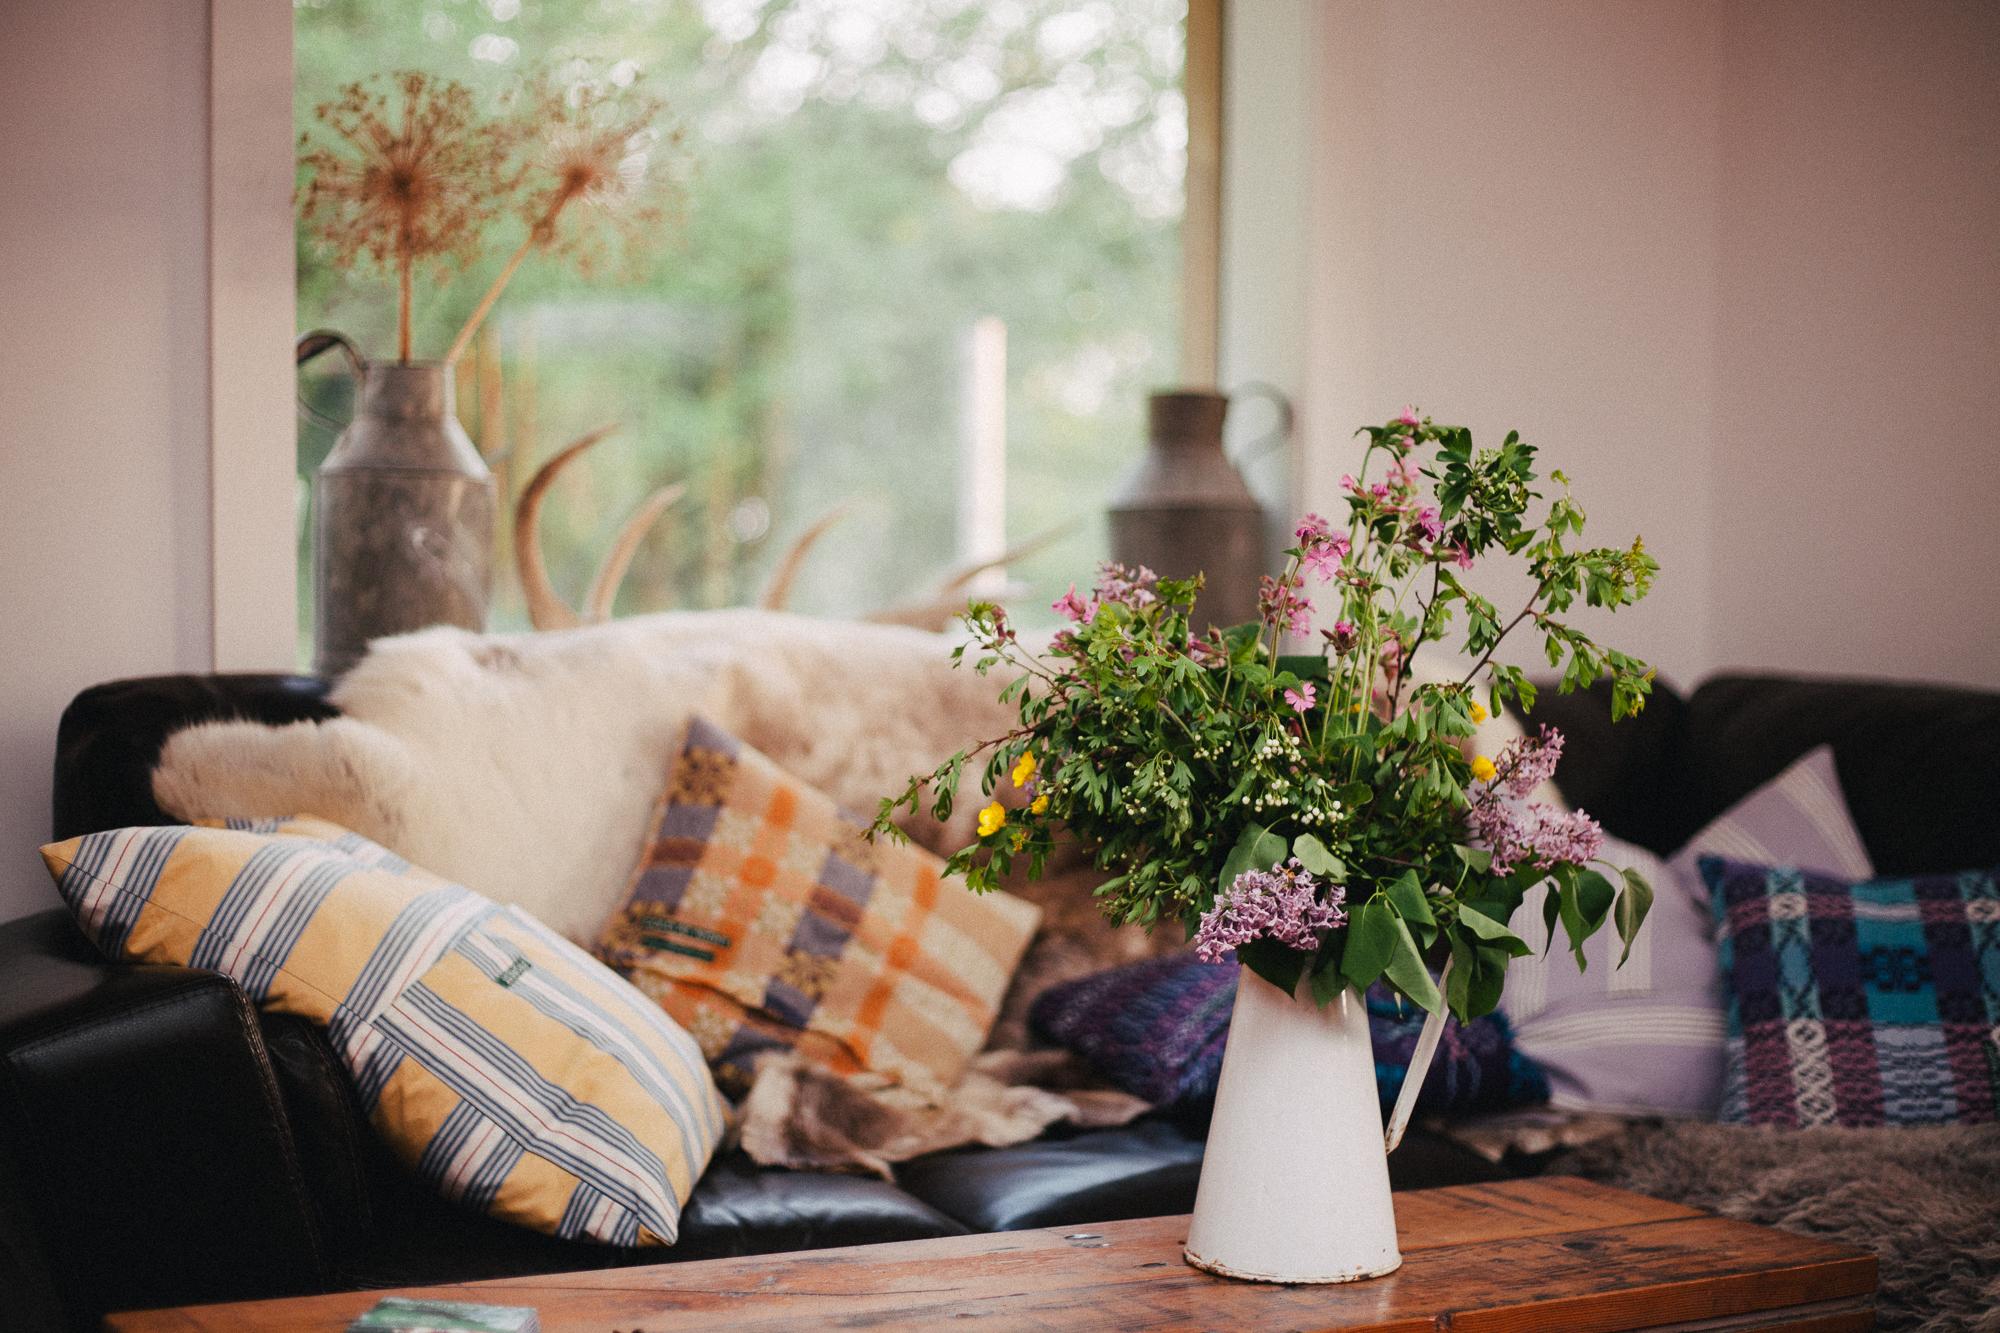 Wildflowers in enamel jug with sofa in background. By Leonie Wise